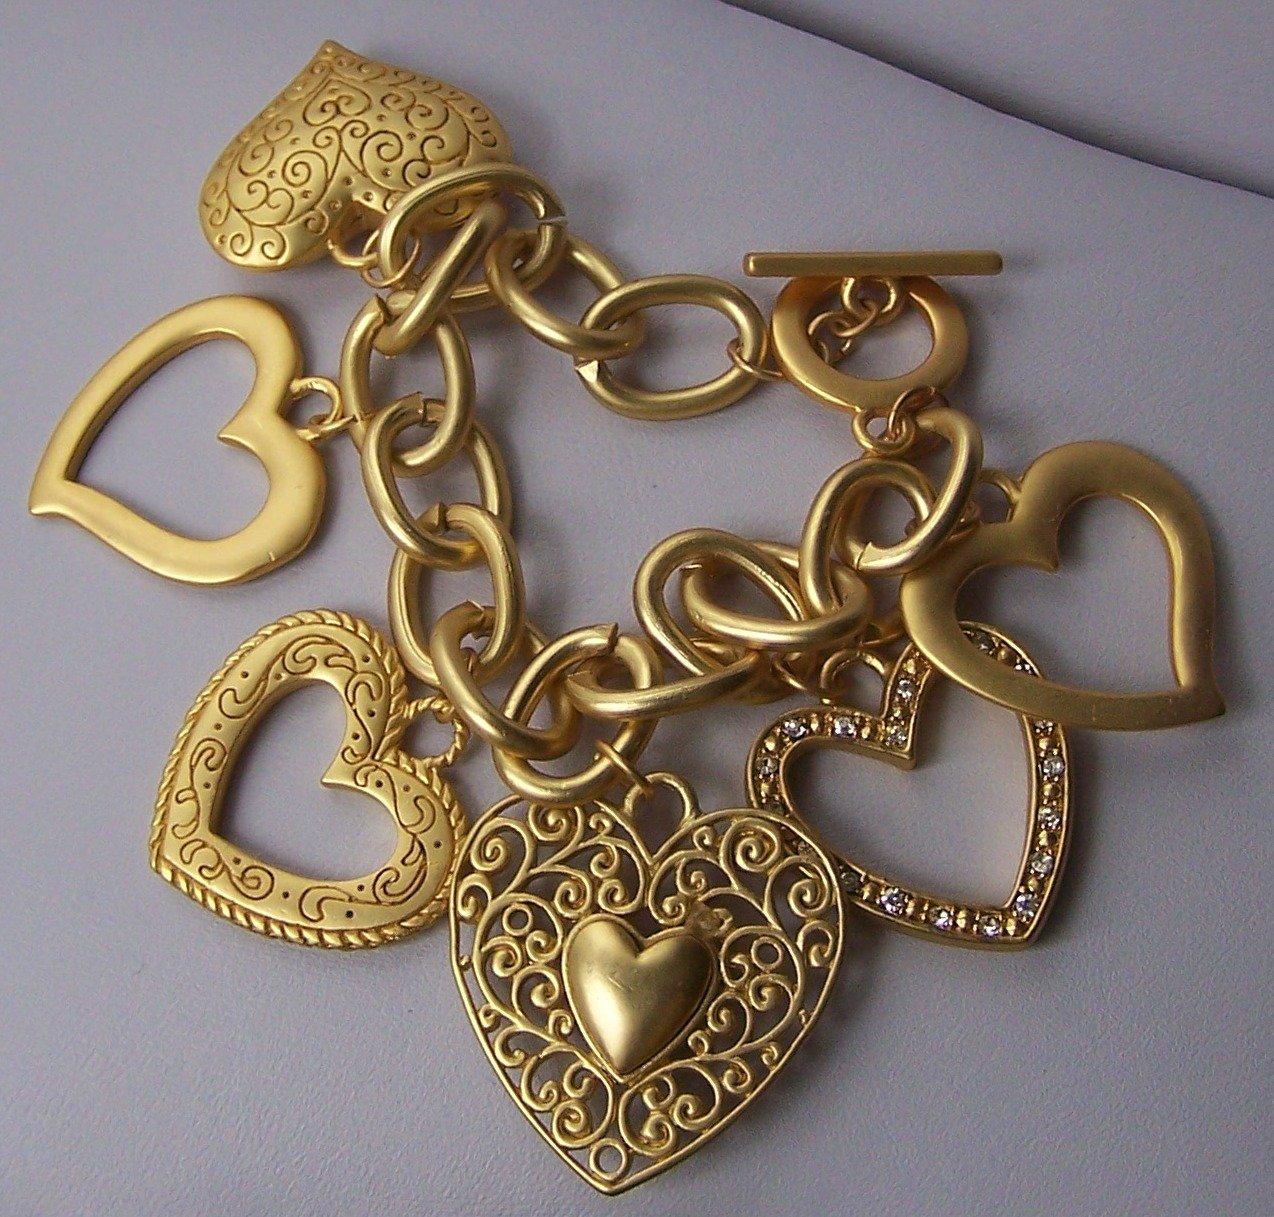 Chunky Filigree Gold Tone Open 3D Heart Love Valentines Day Charm Bracelet